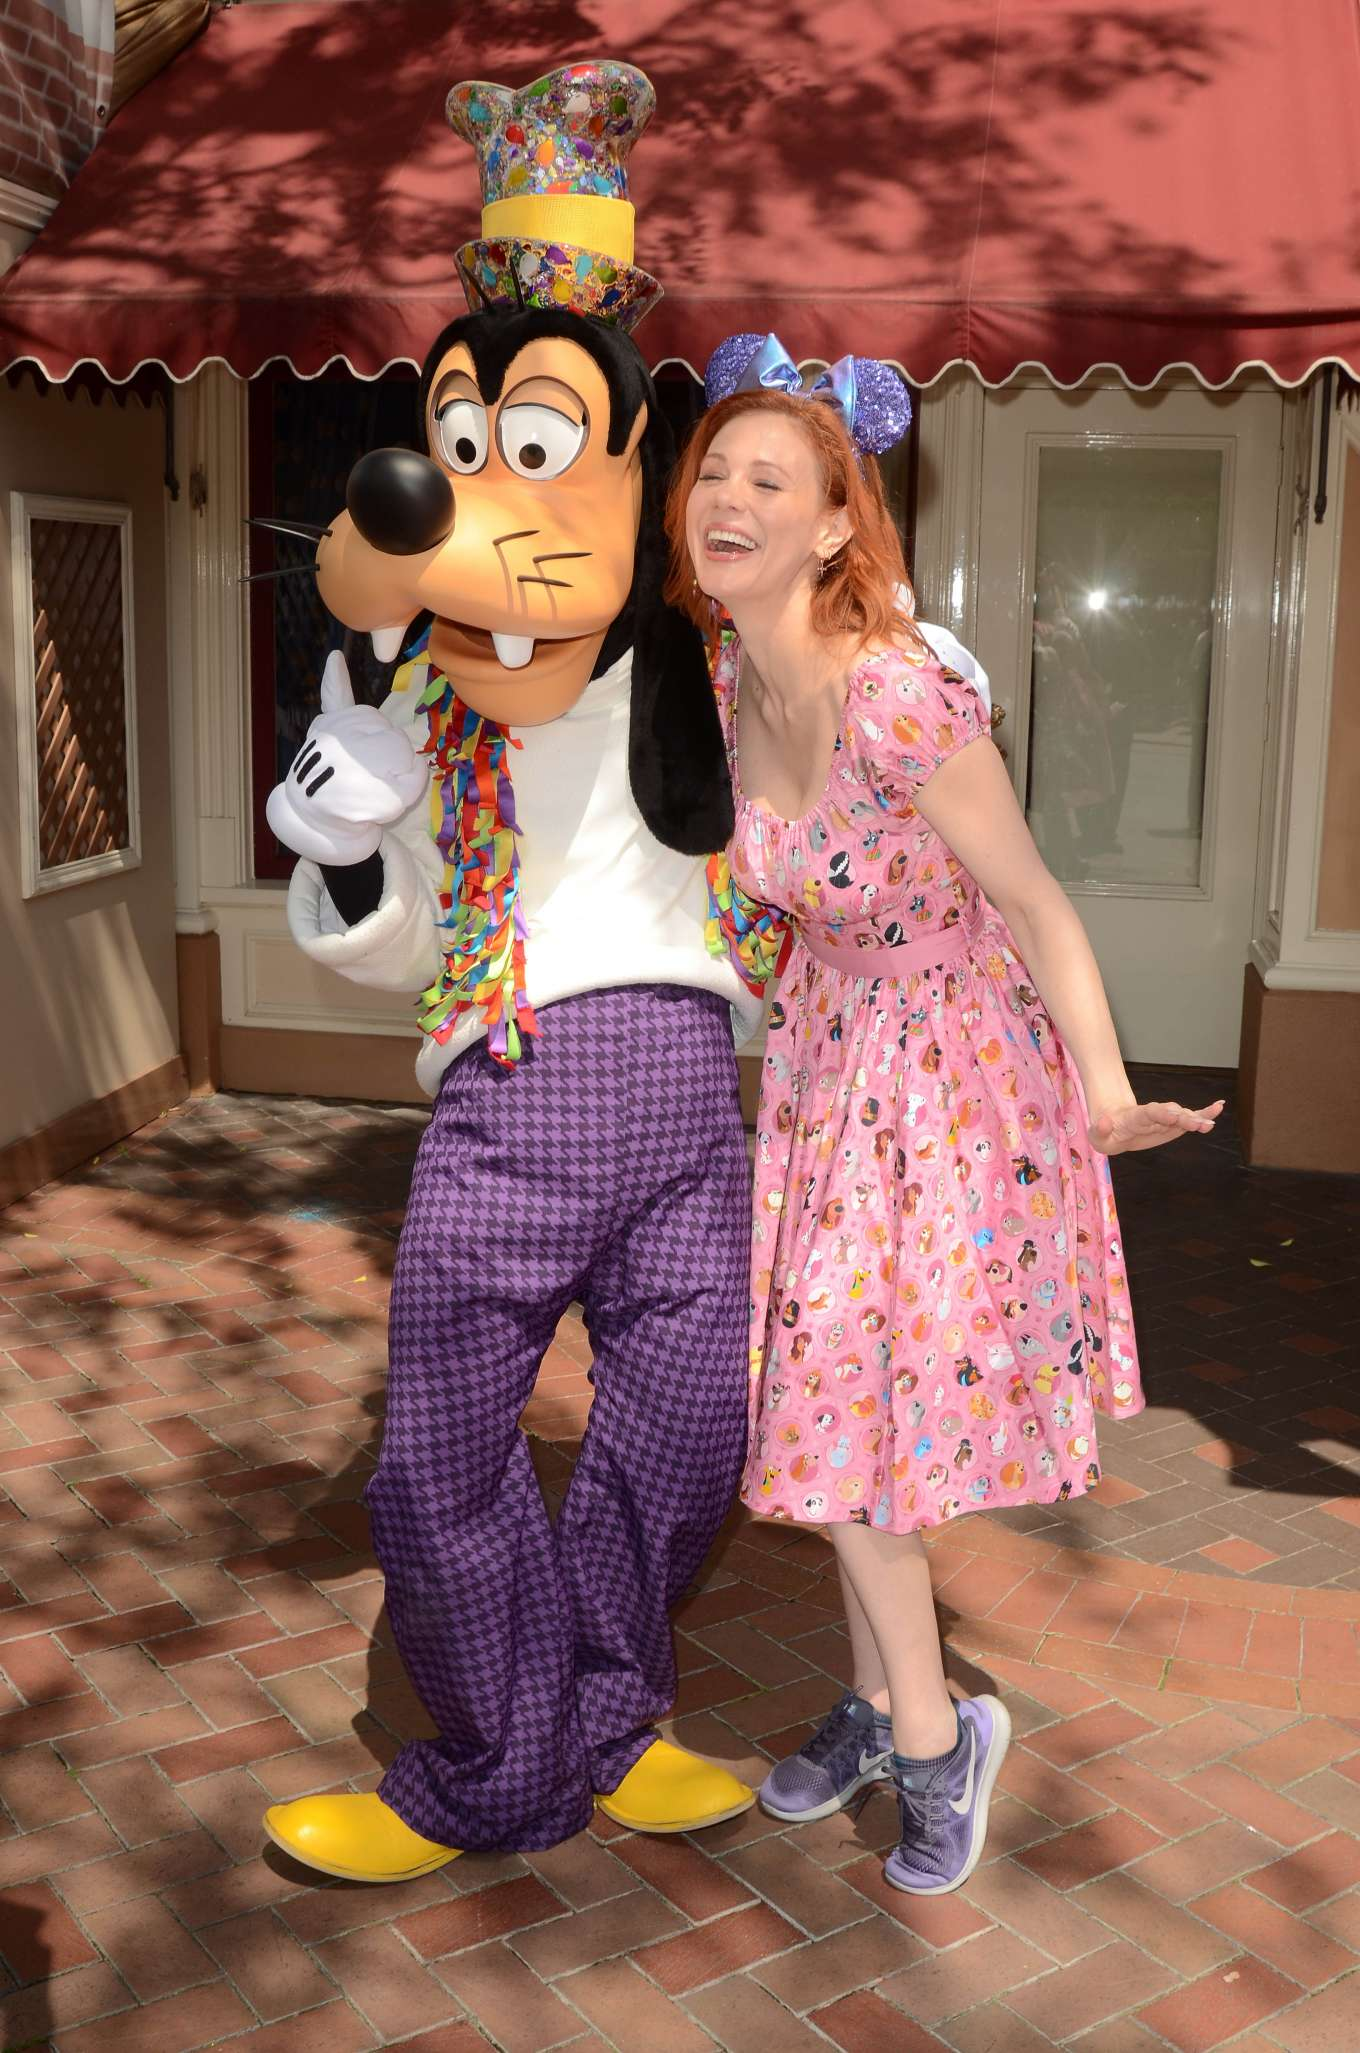 Maitland Ward 2019 : Maitland Ward: Celebrating International Star Wars Day at Disneyland -17